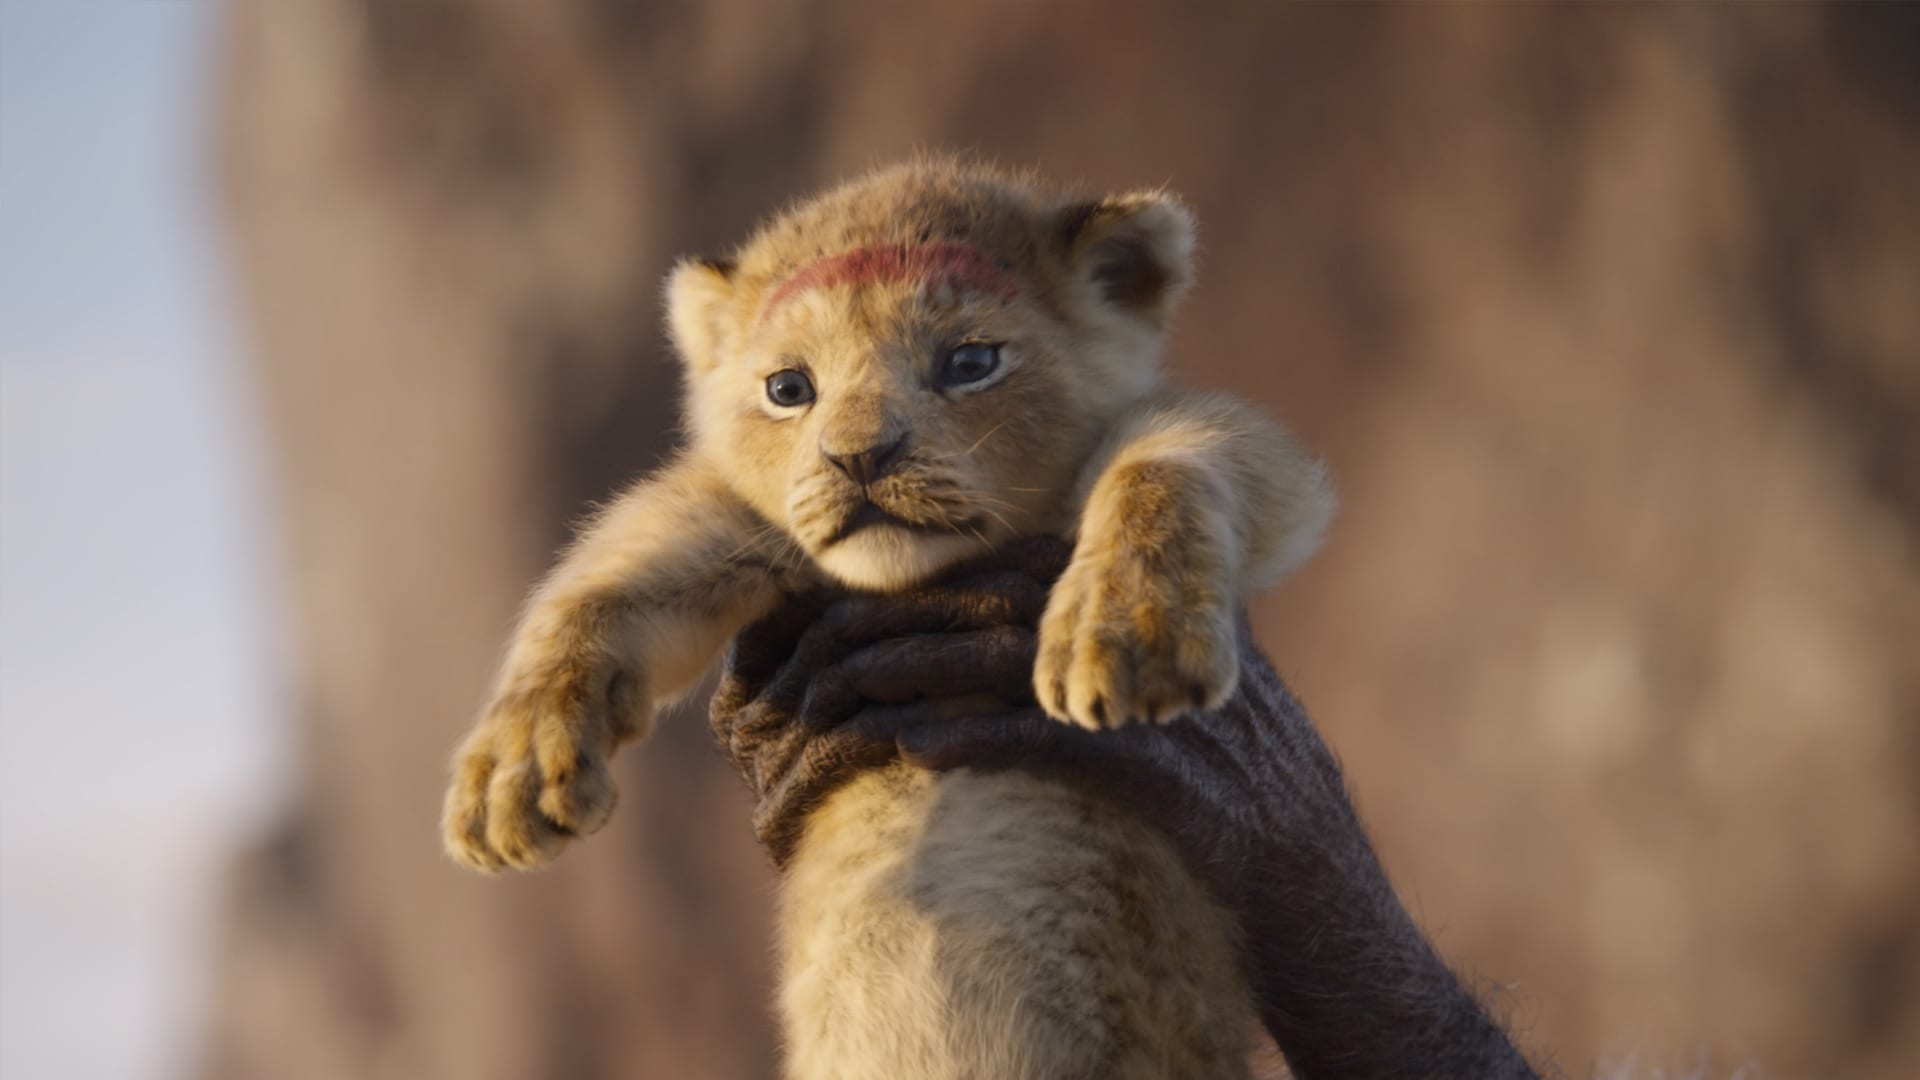 The Lion King 2019 Disney Movies